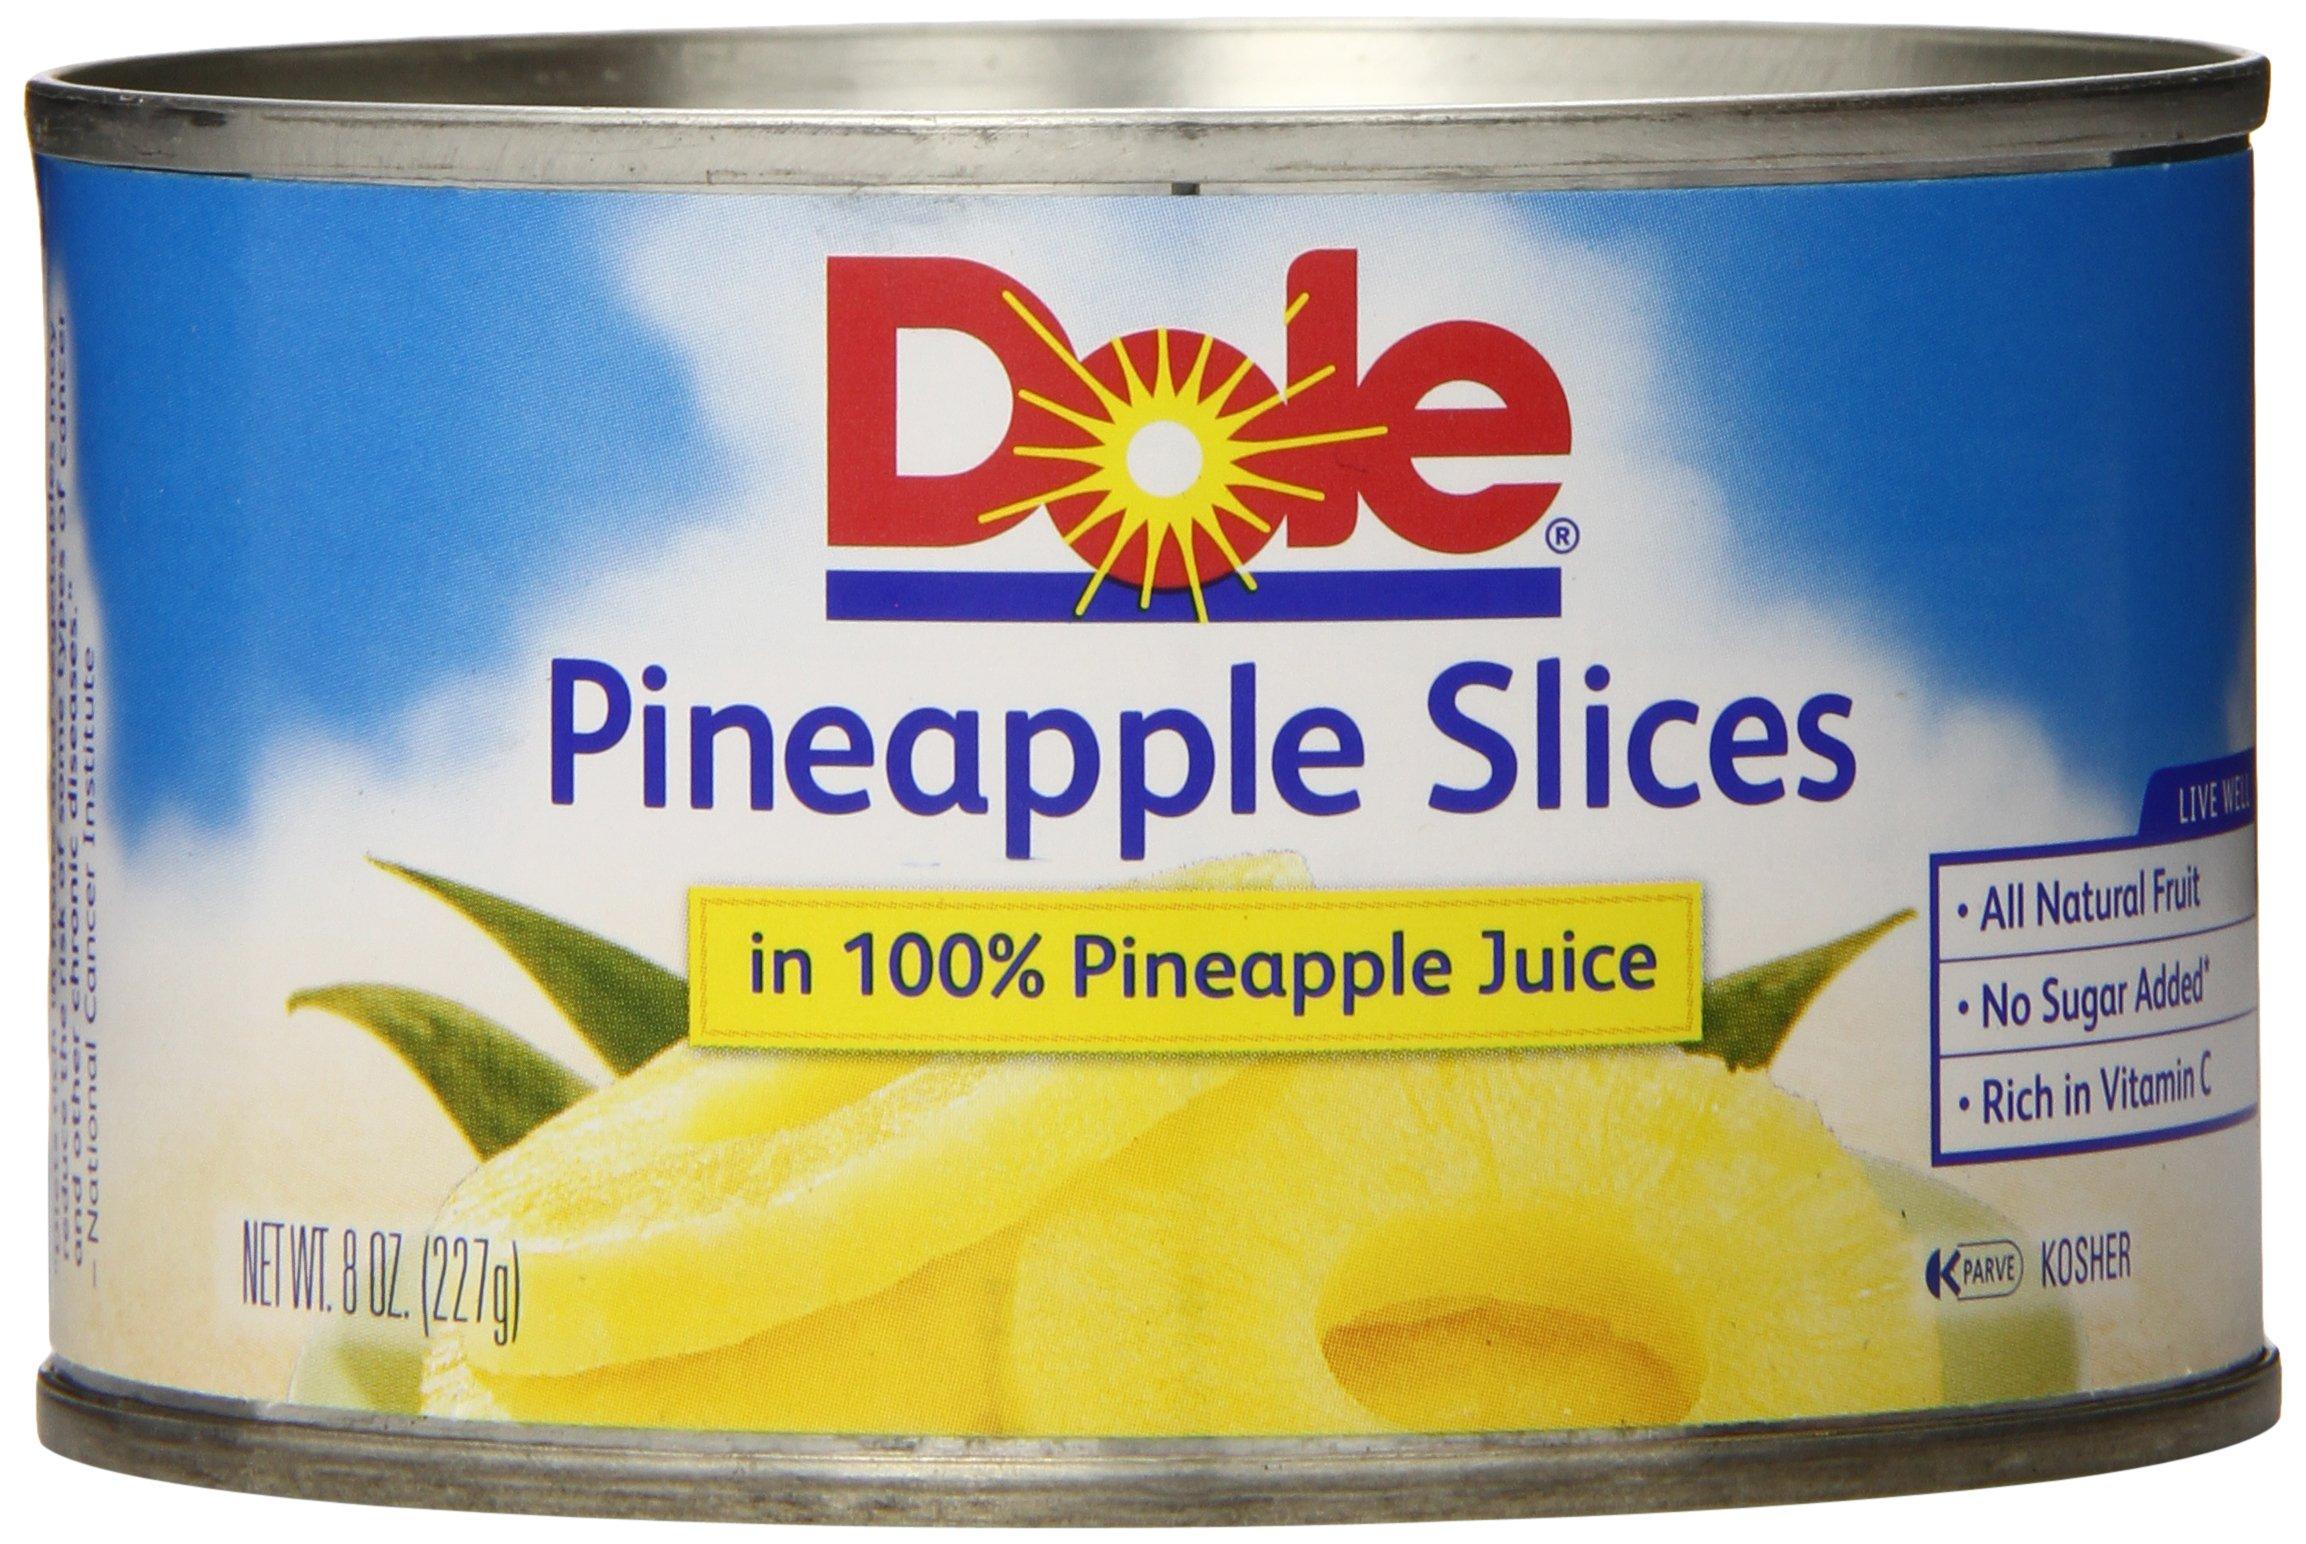 Is Dole Pineapple Slices Gluten Free Amazon.com : Oce...